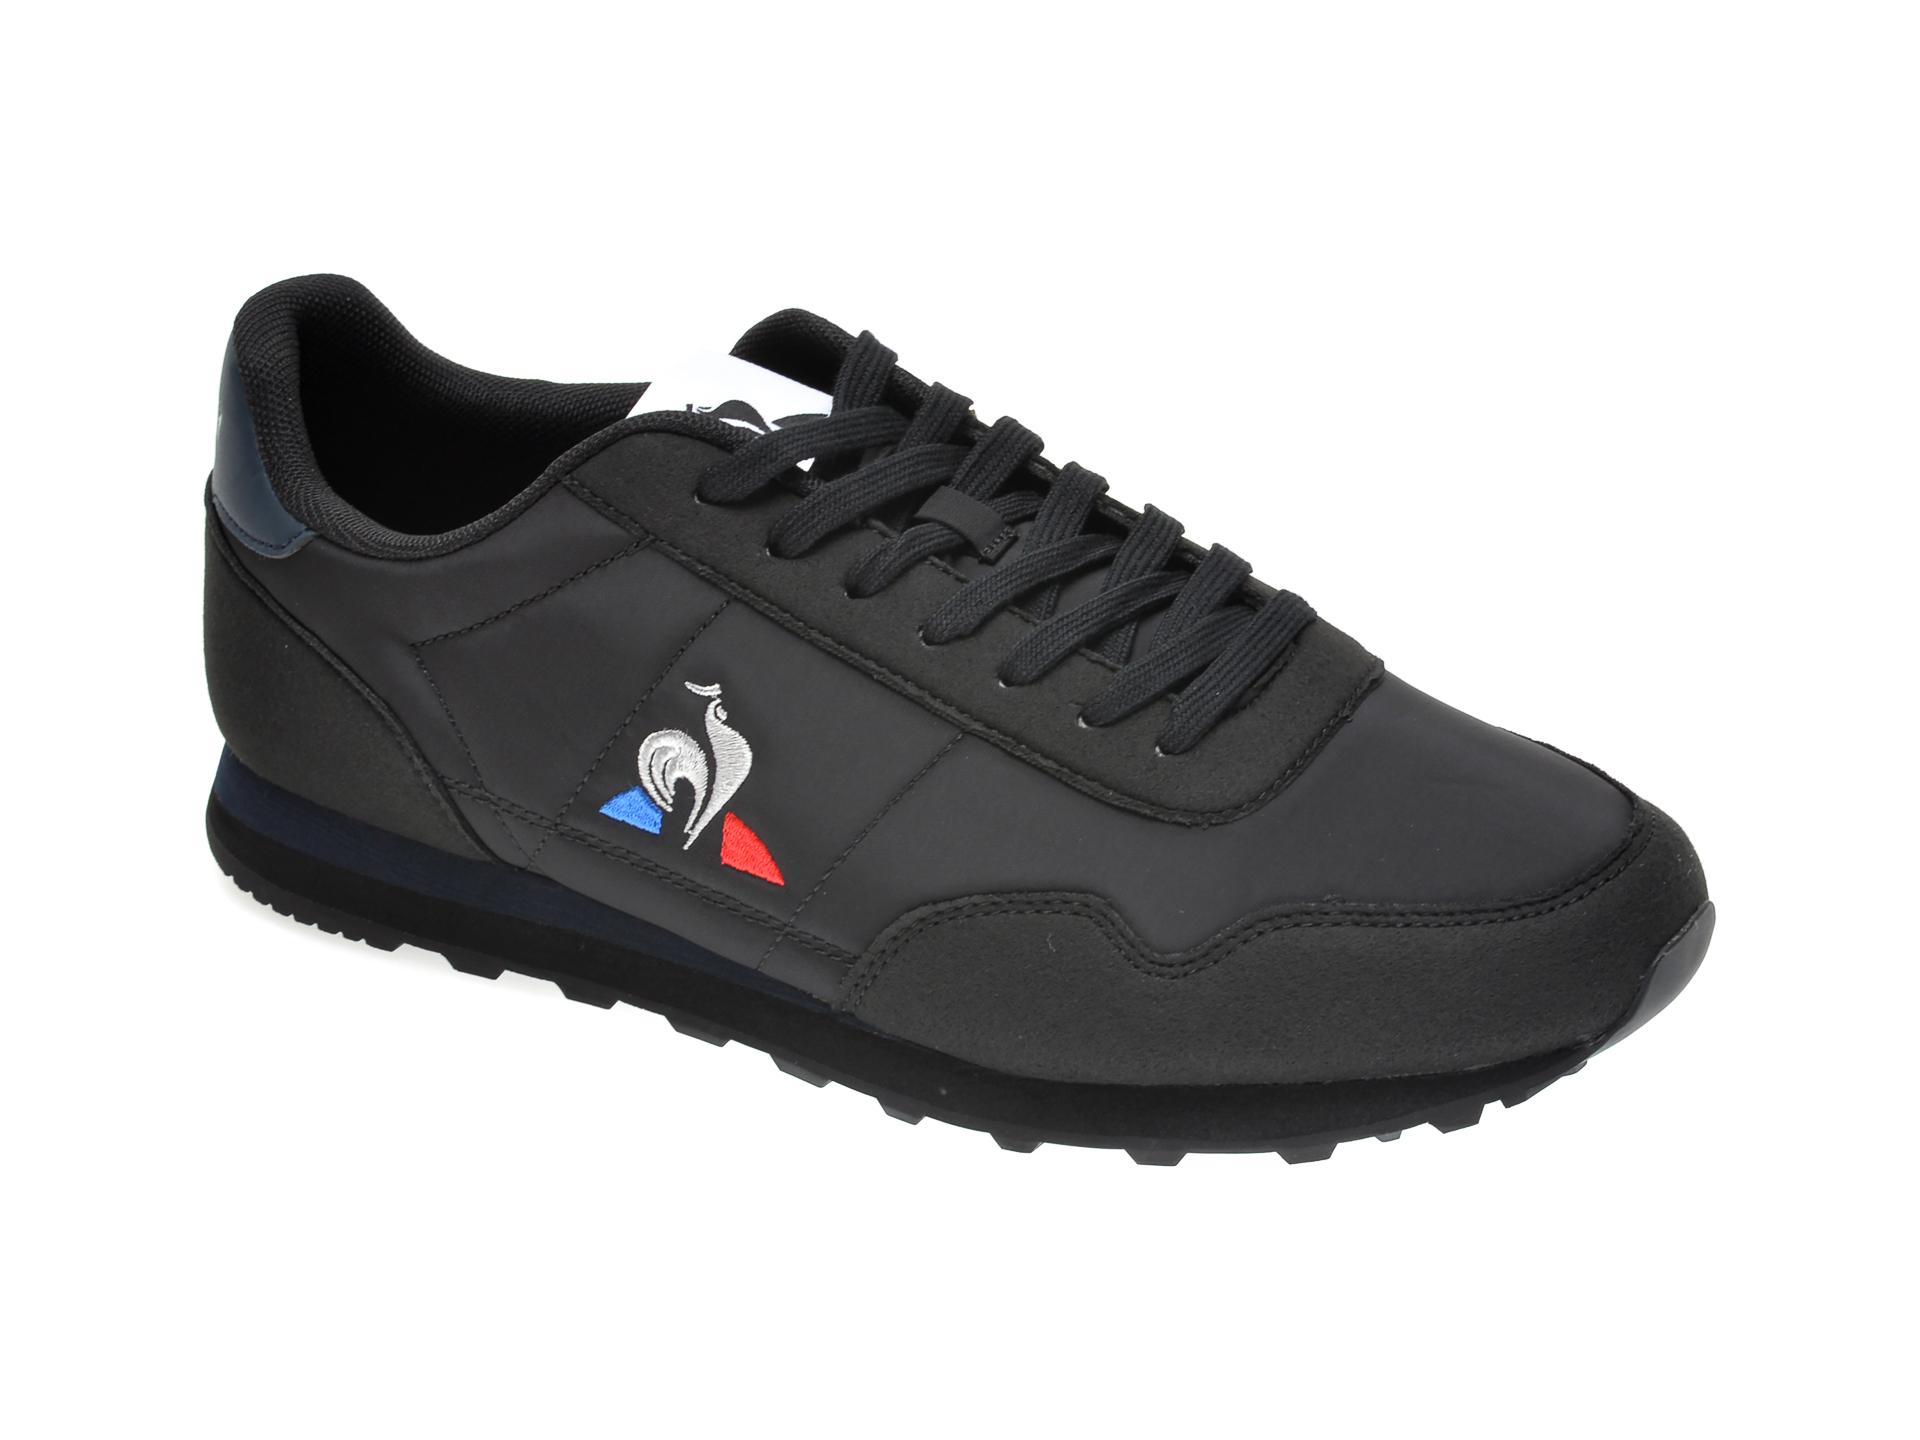 Pantofi sport LE COQ SPORTIF negri, 2020349, din material textil si piele ecologica imagine